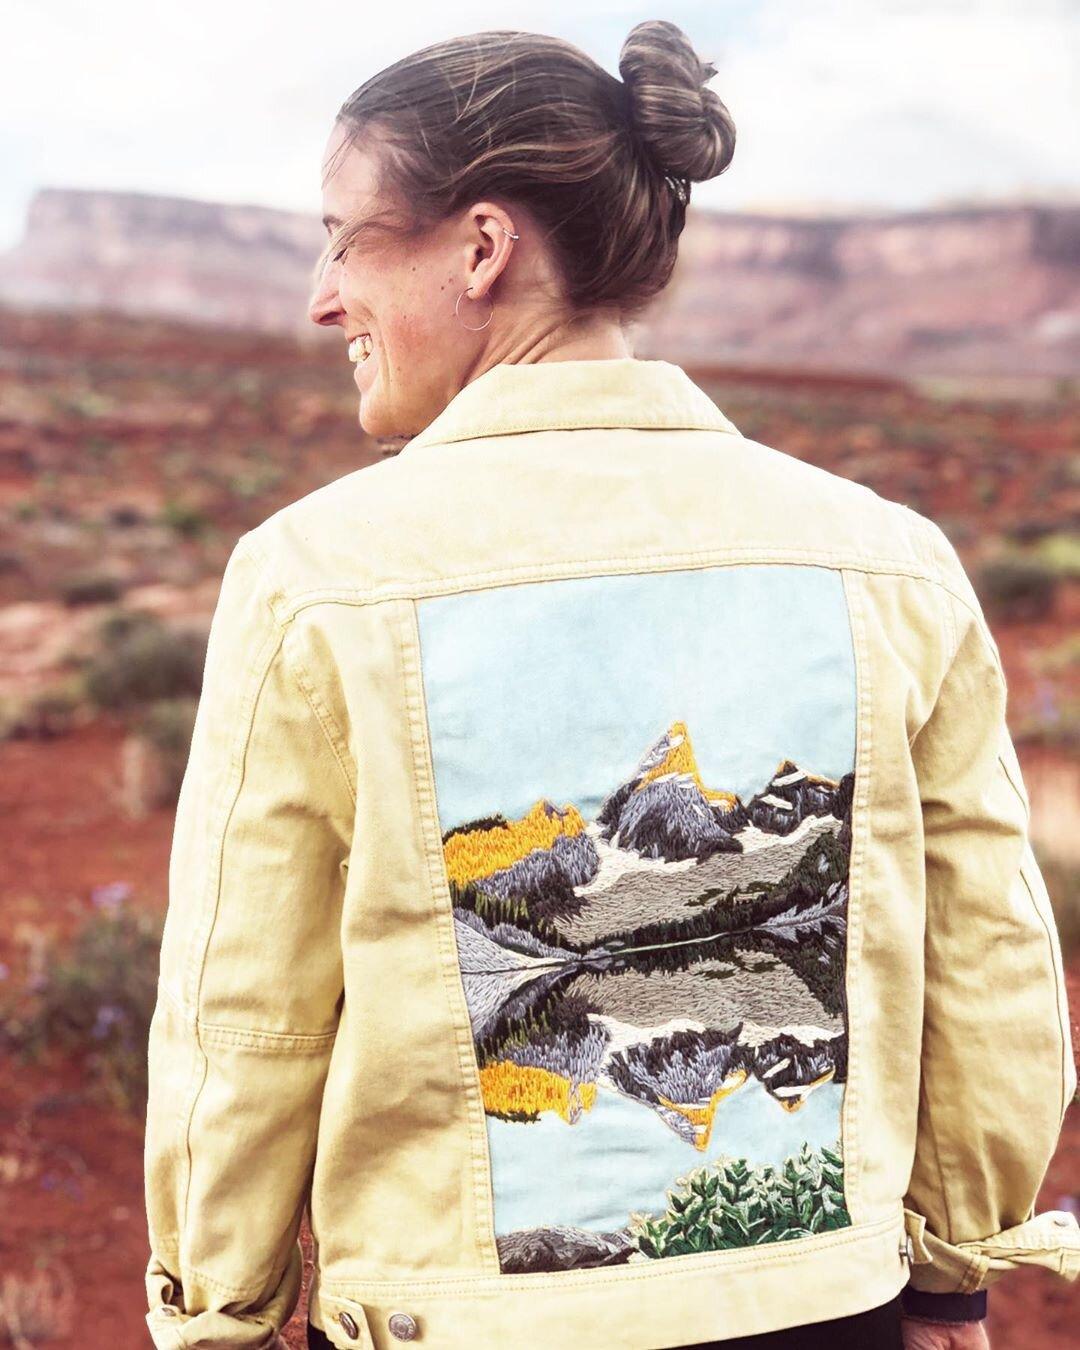 Emma Longcope | Creative Lady DIrectory